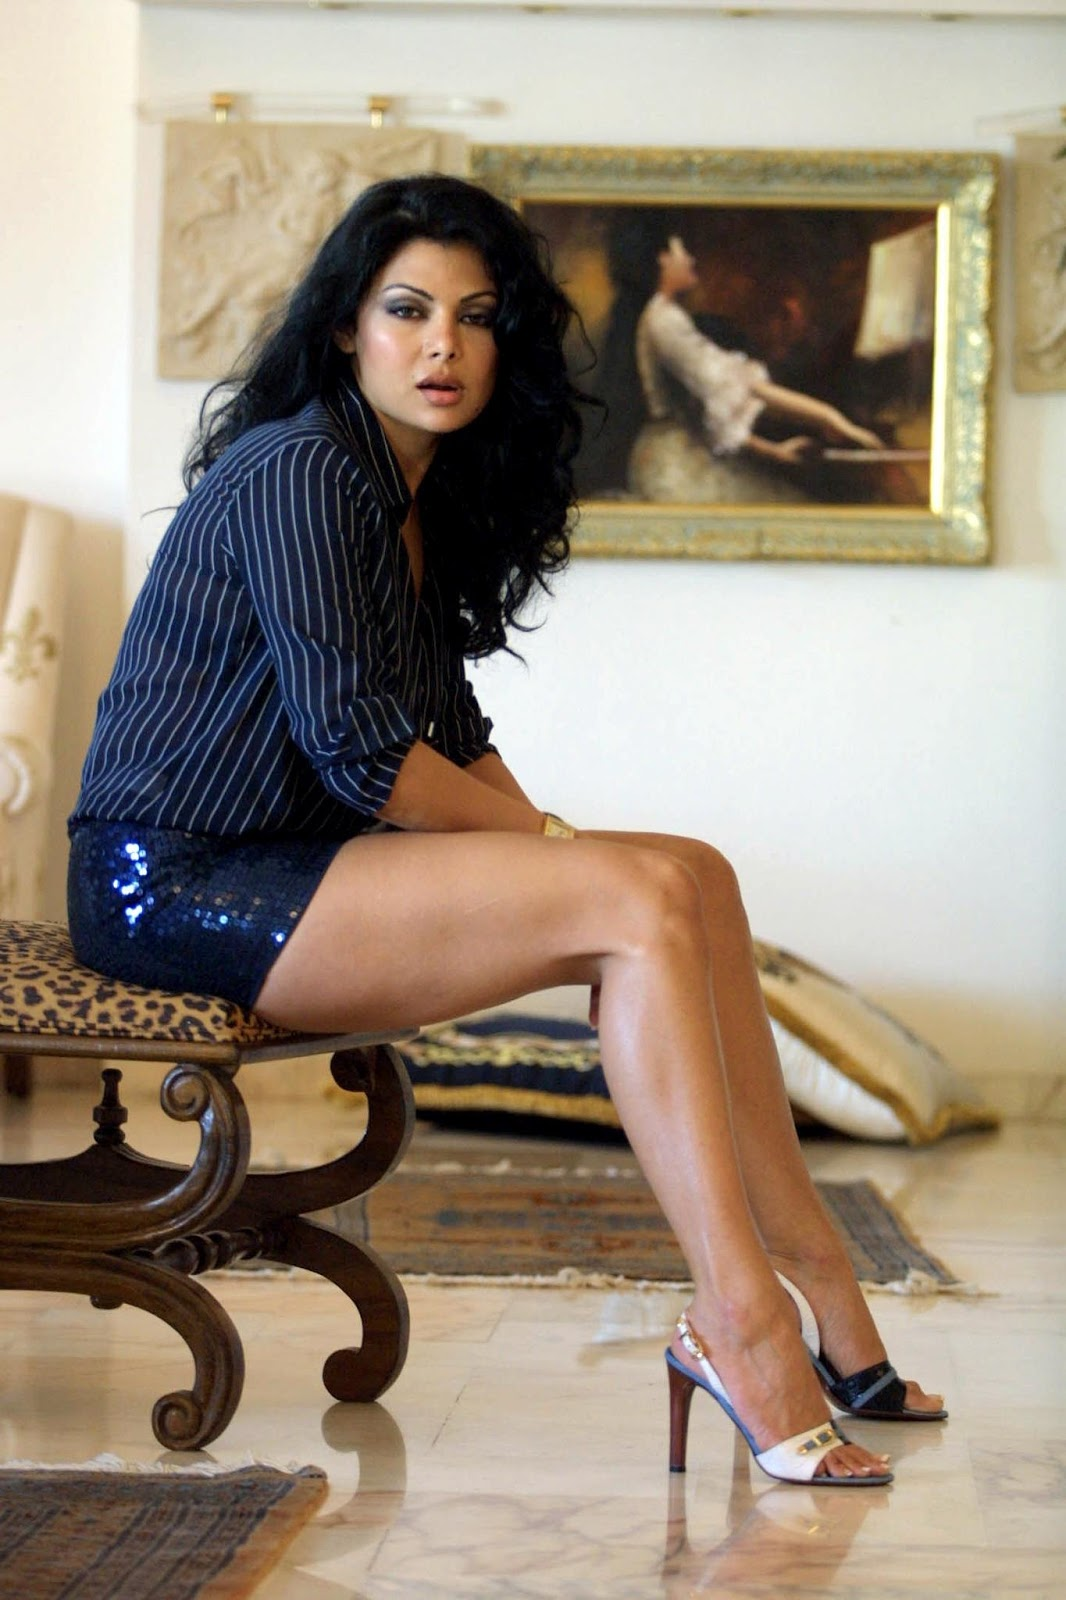 Haifa hot and sexy dance with shaggy